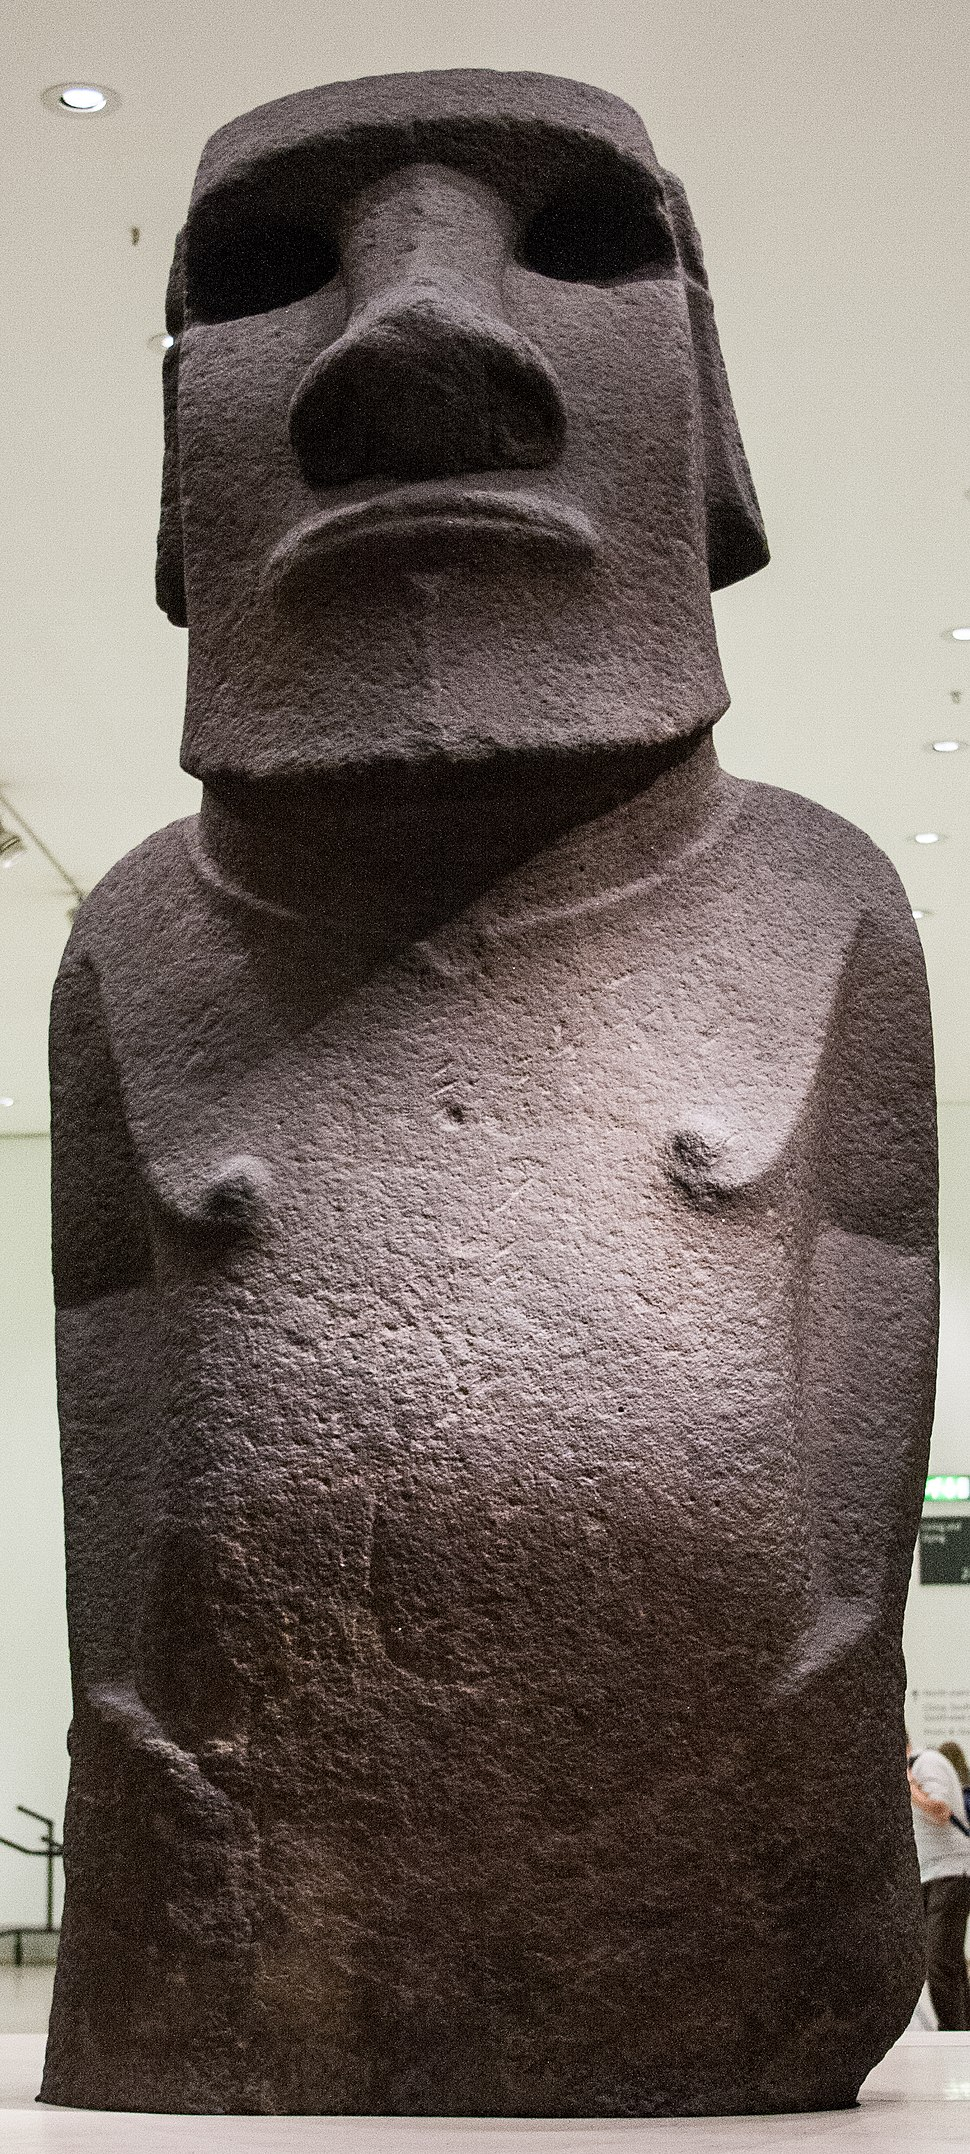 Hoa Hakananai%27a - Moai in the British Museum.jpeg